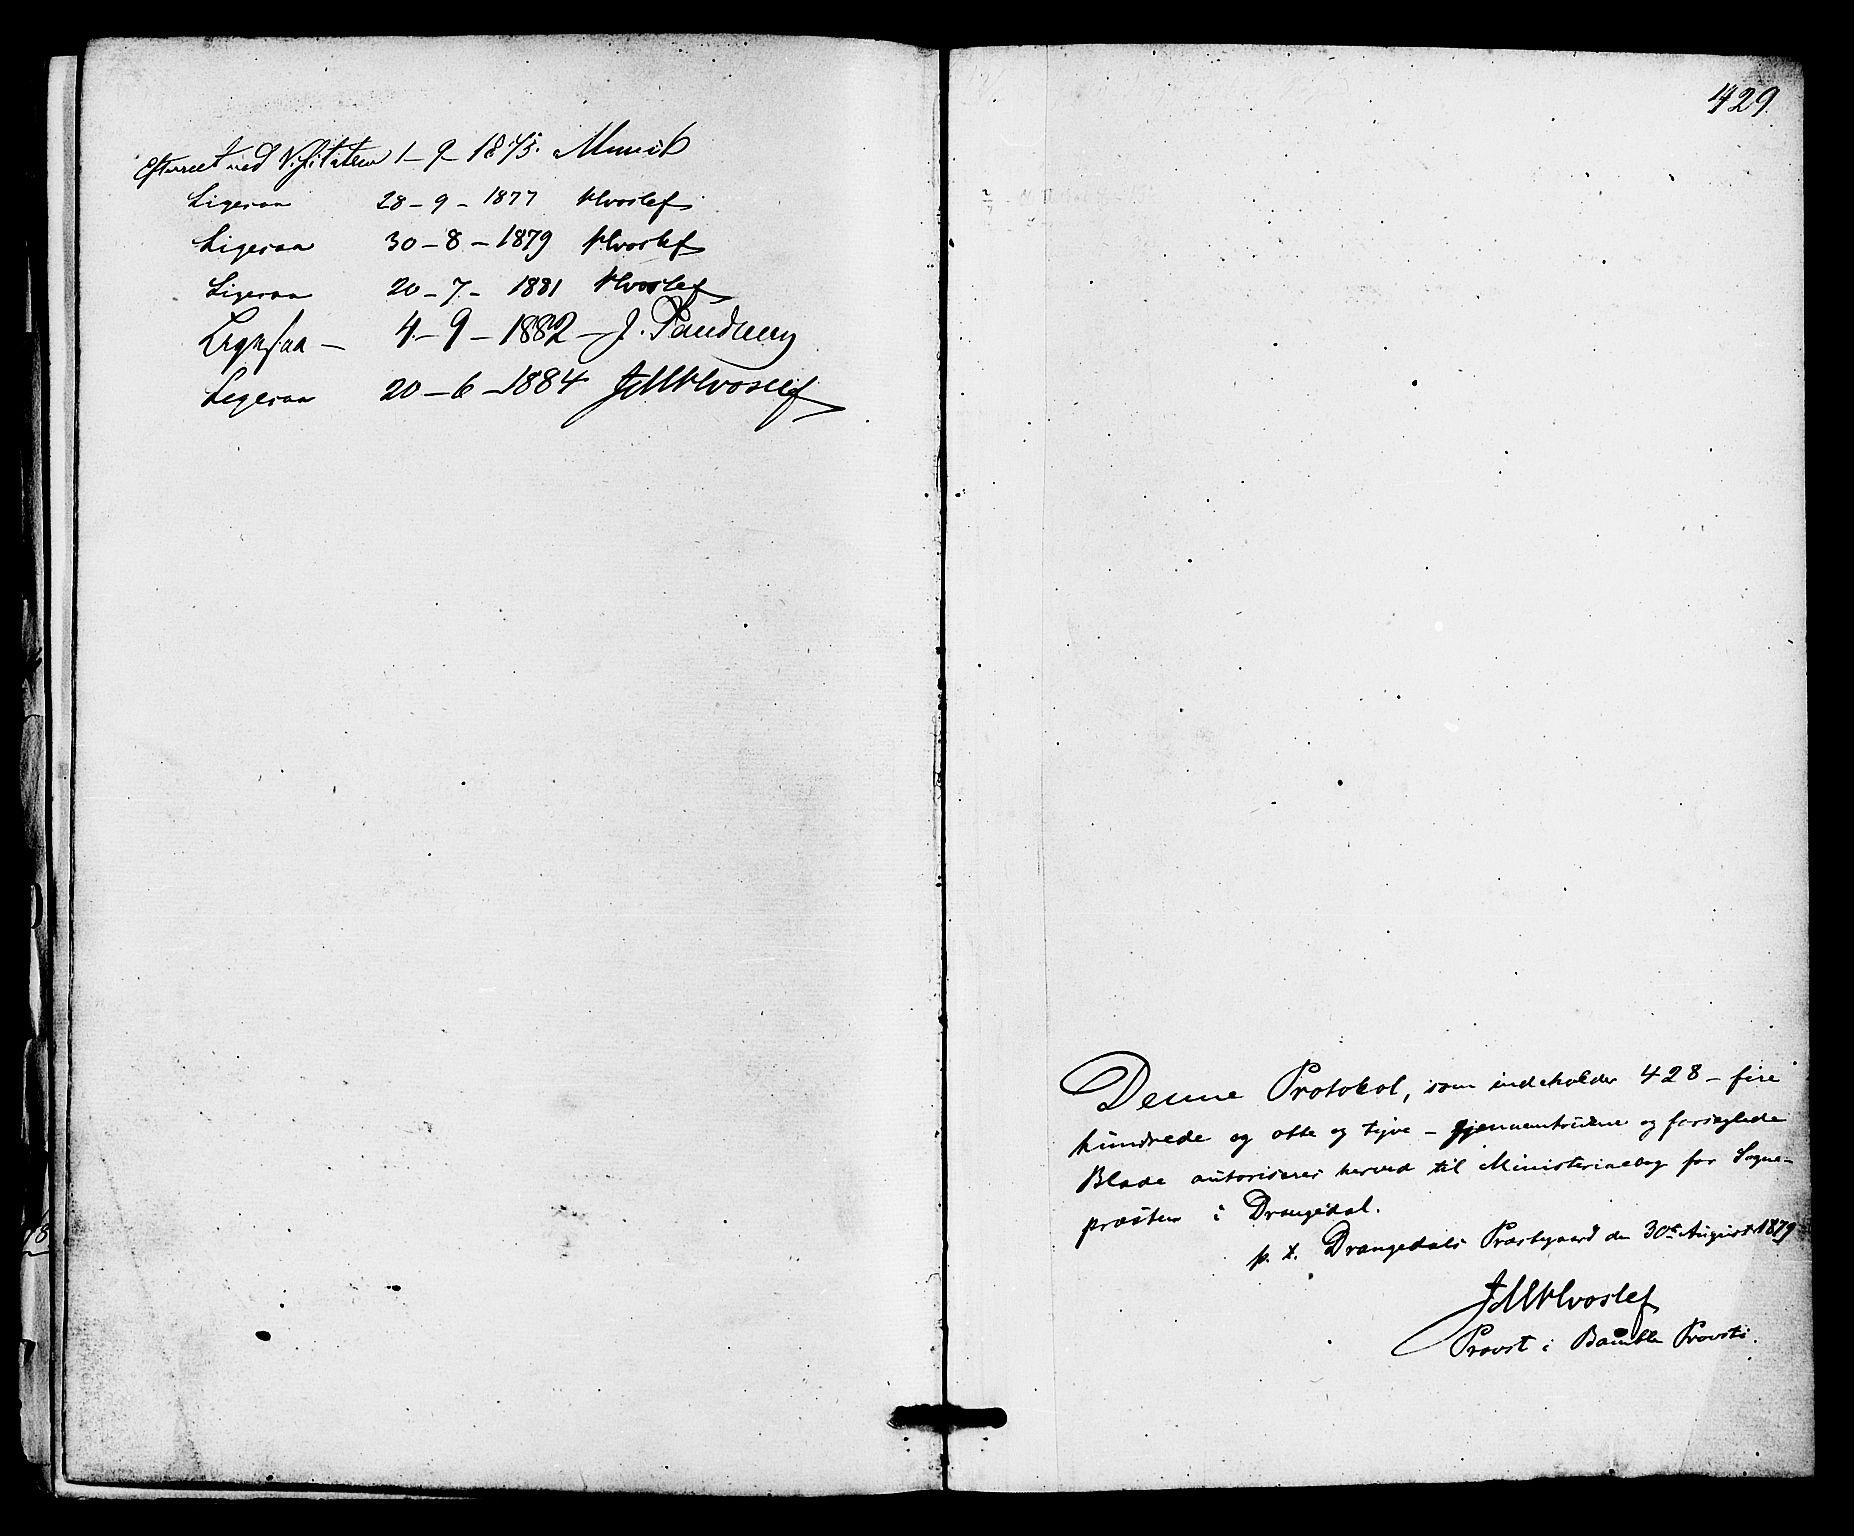 SAKO, Drangedal kirkebøker, F/Fa/L0009: Ministerialbok nr. 9 /1, 1872-1884, s. 429